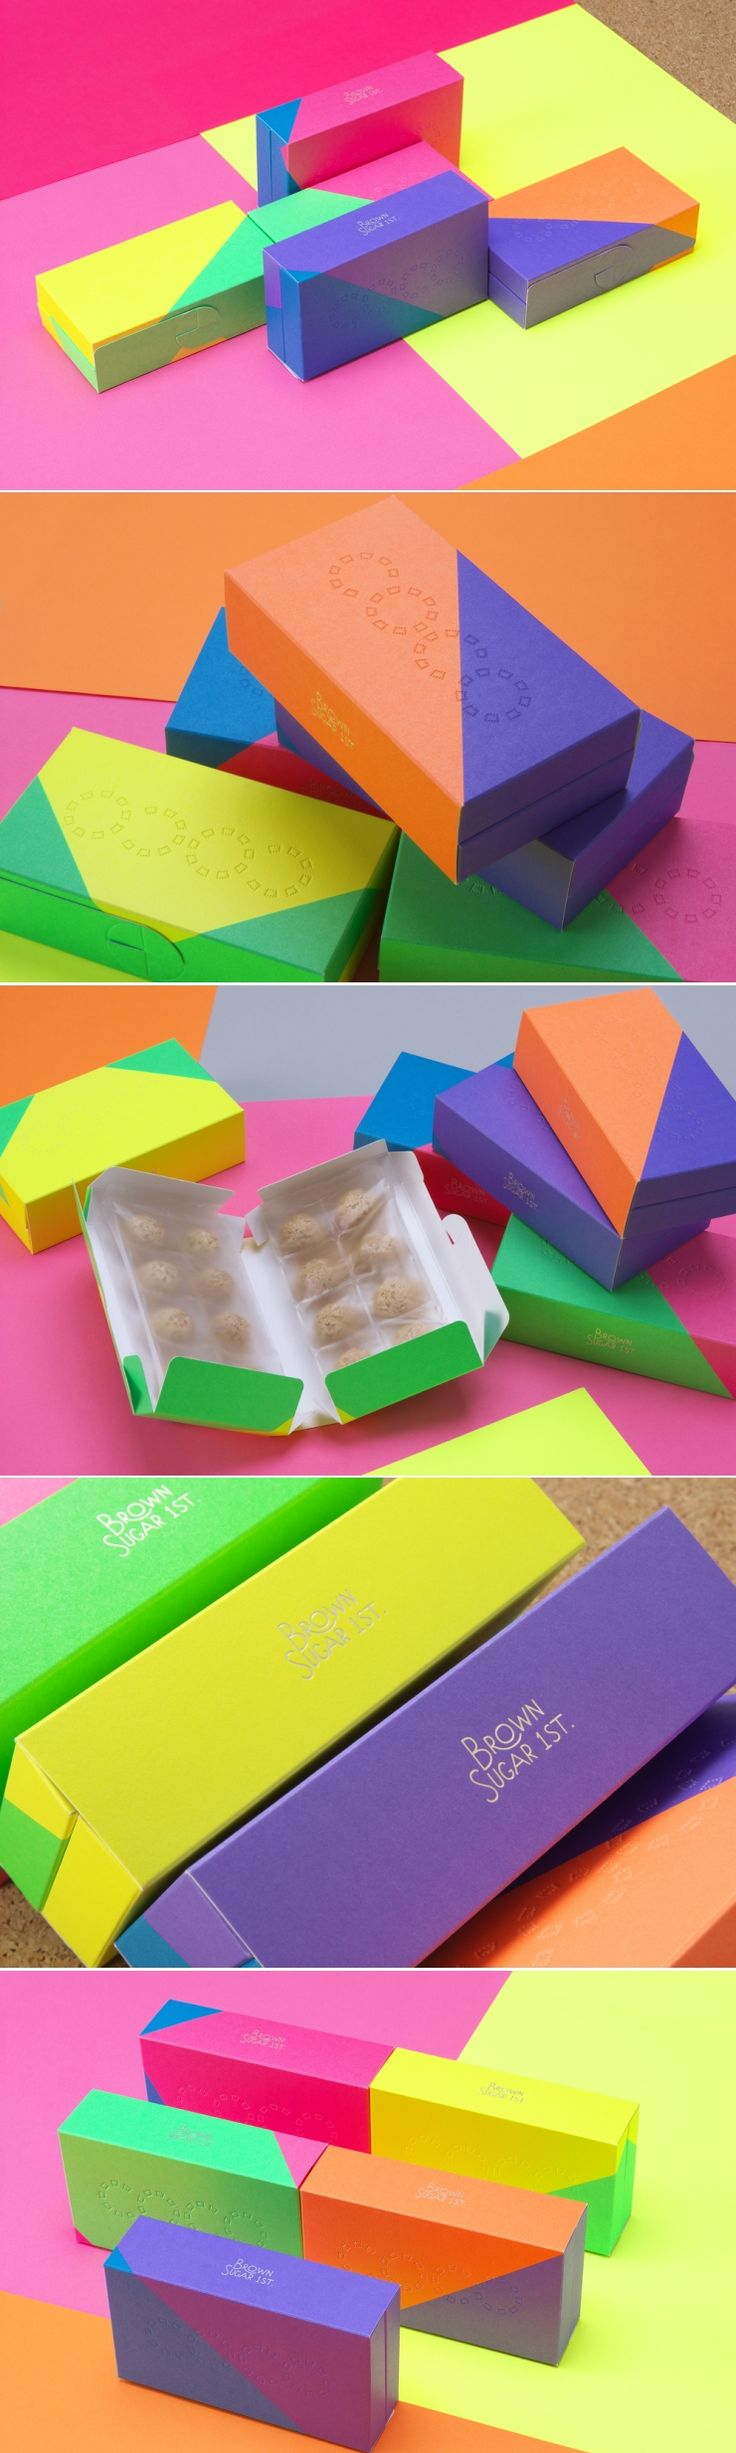 The Dieline Awards 2016: Brown Sugar 1st.'s Coco Cookie- Keiko Akatsuka & Associates — The Dieline - Branding & Packaging Design